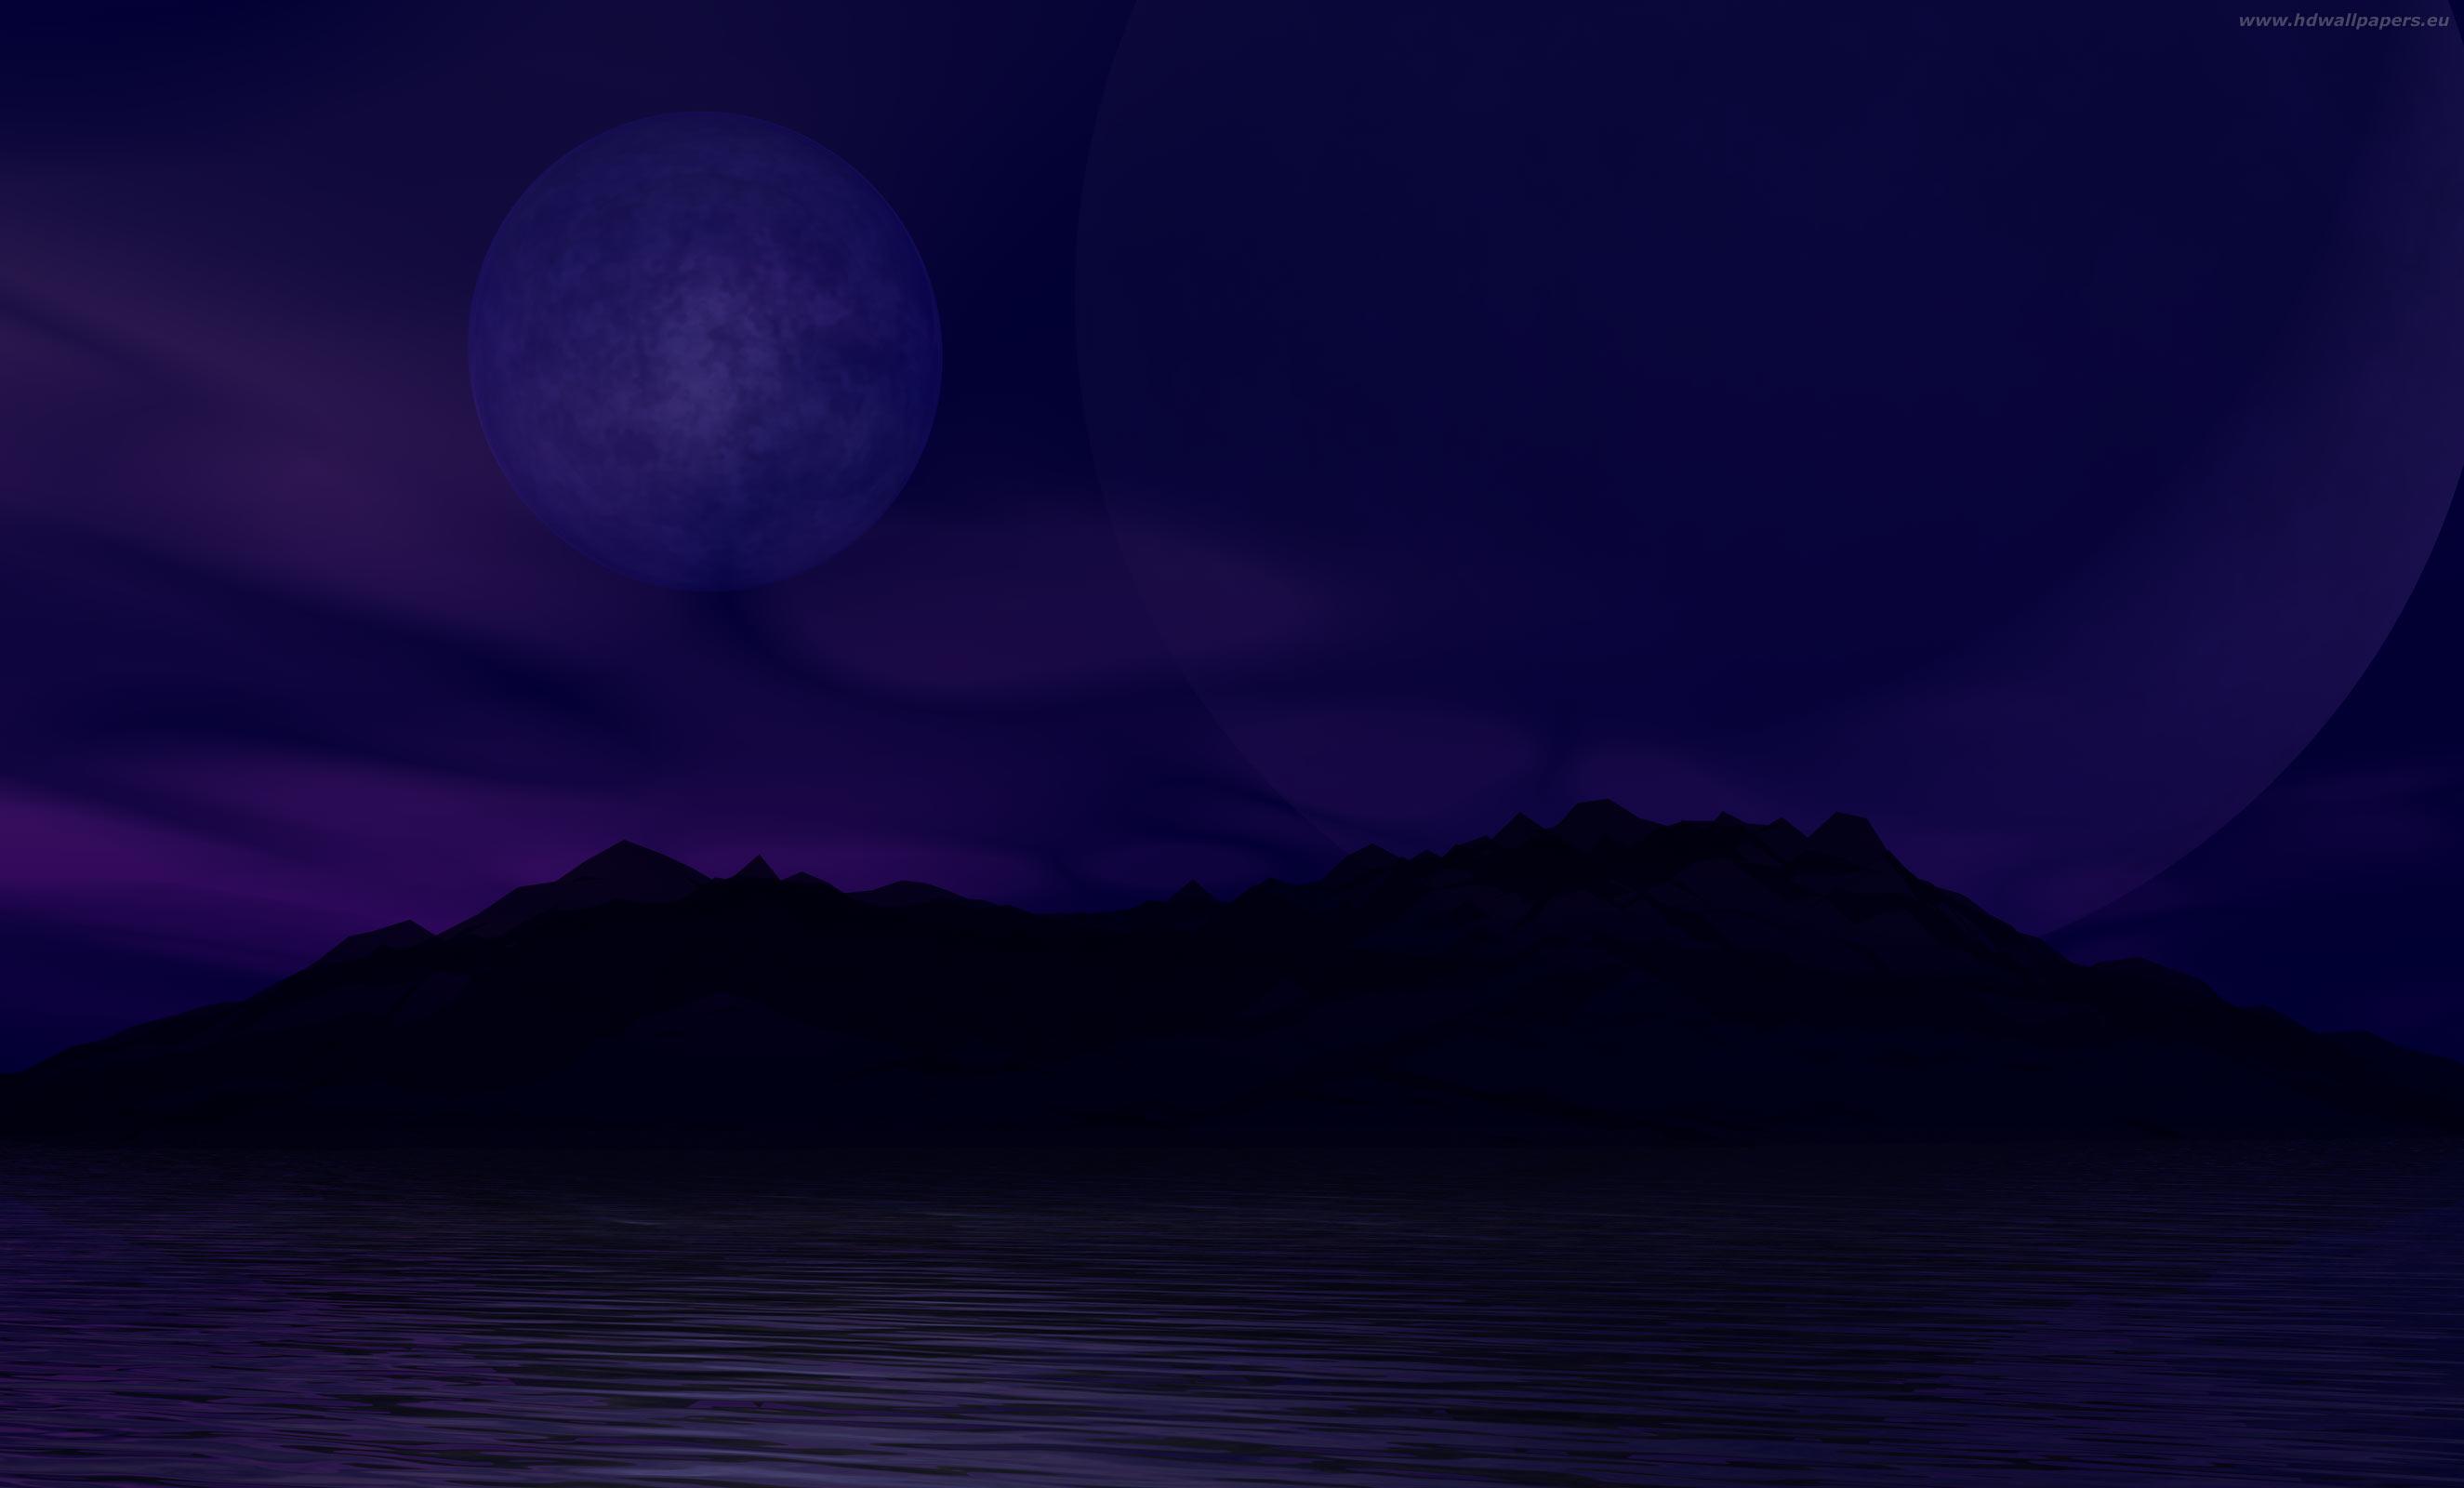 dark blue wallpaper 2650x1600